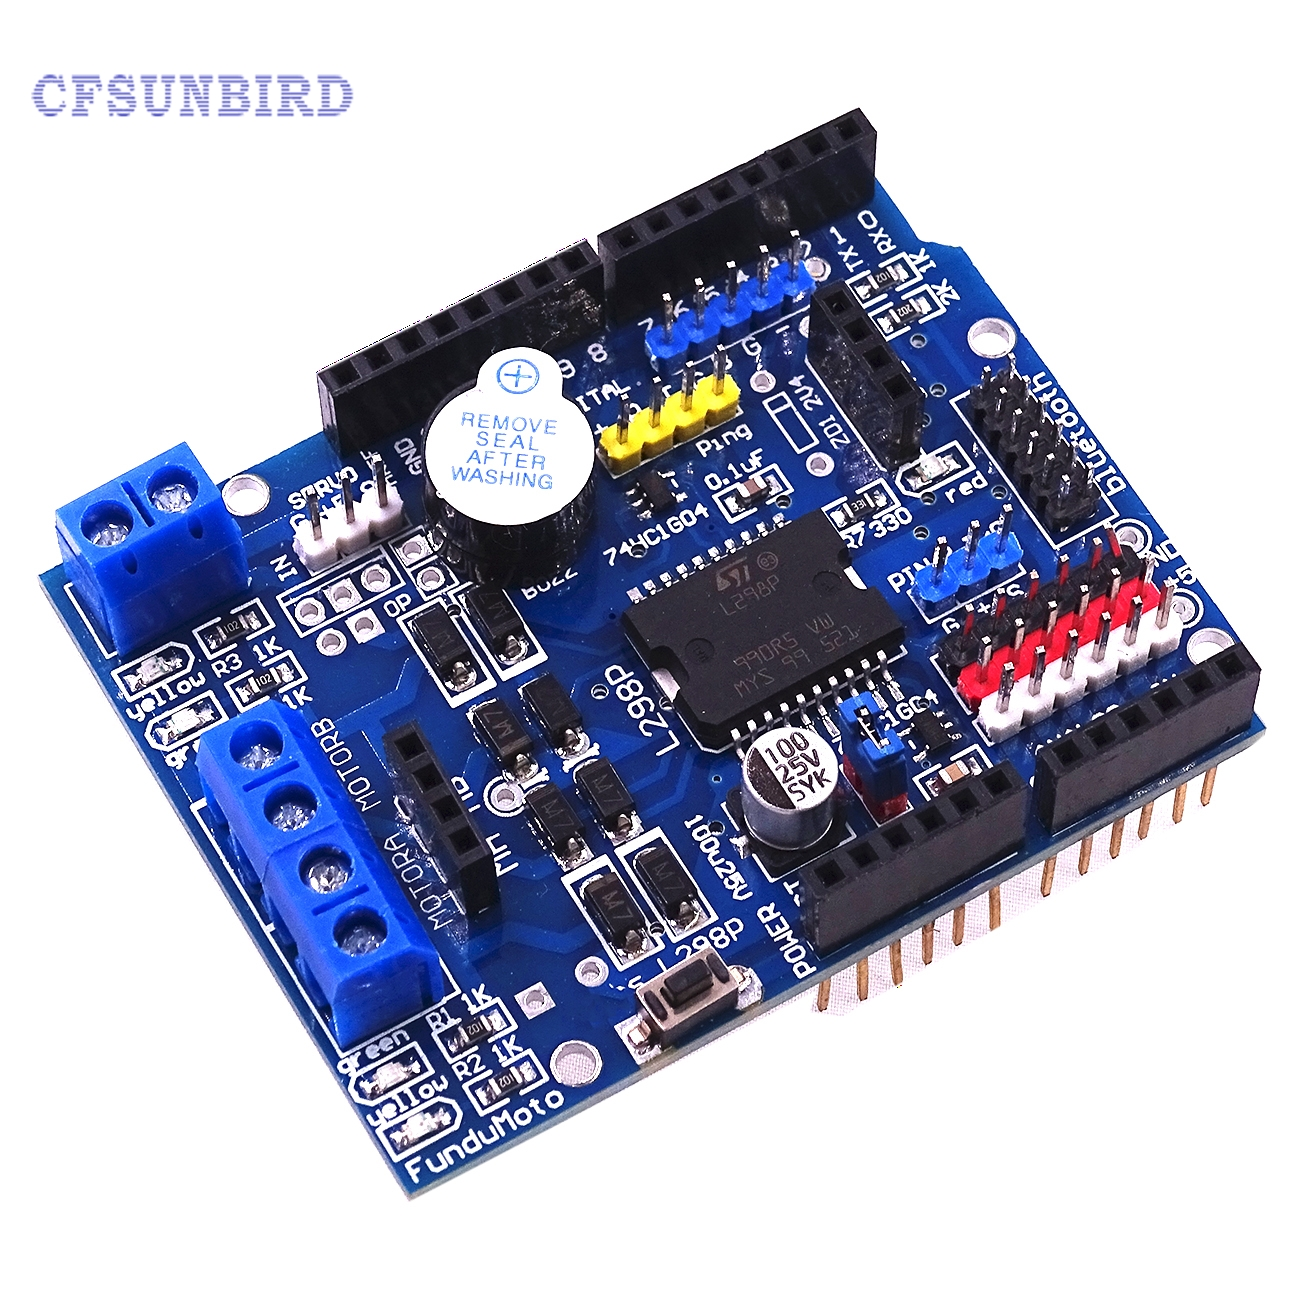 L298P PWM Speed Controller Dual High-Power H-bridge Driver ,Bluetooth Interface, L298P Motor Shield Board for Arduino 10 50v 100a 5000w reversible dc motor speed controller pwm control soft start high quality